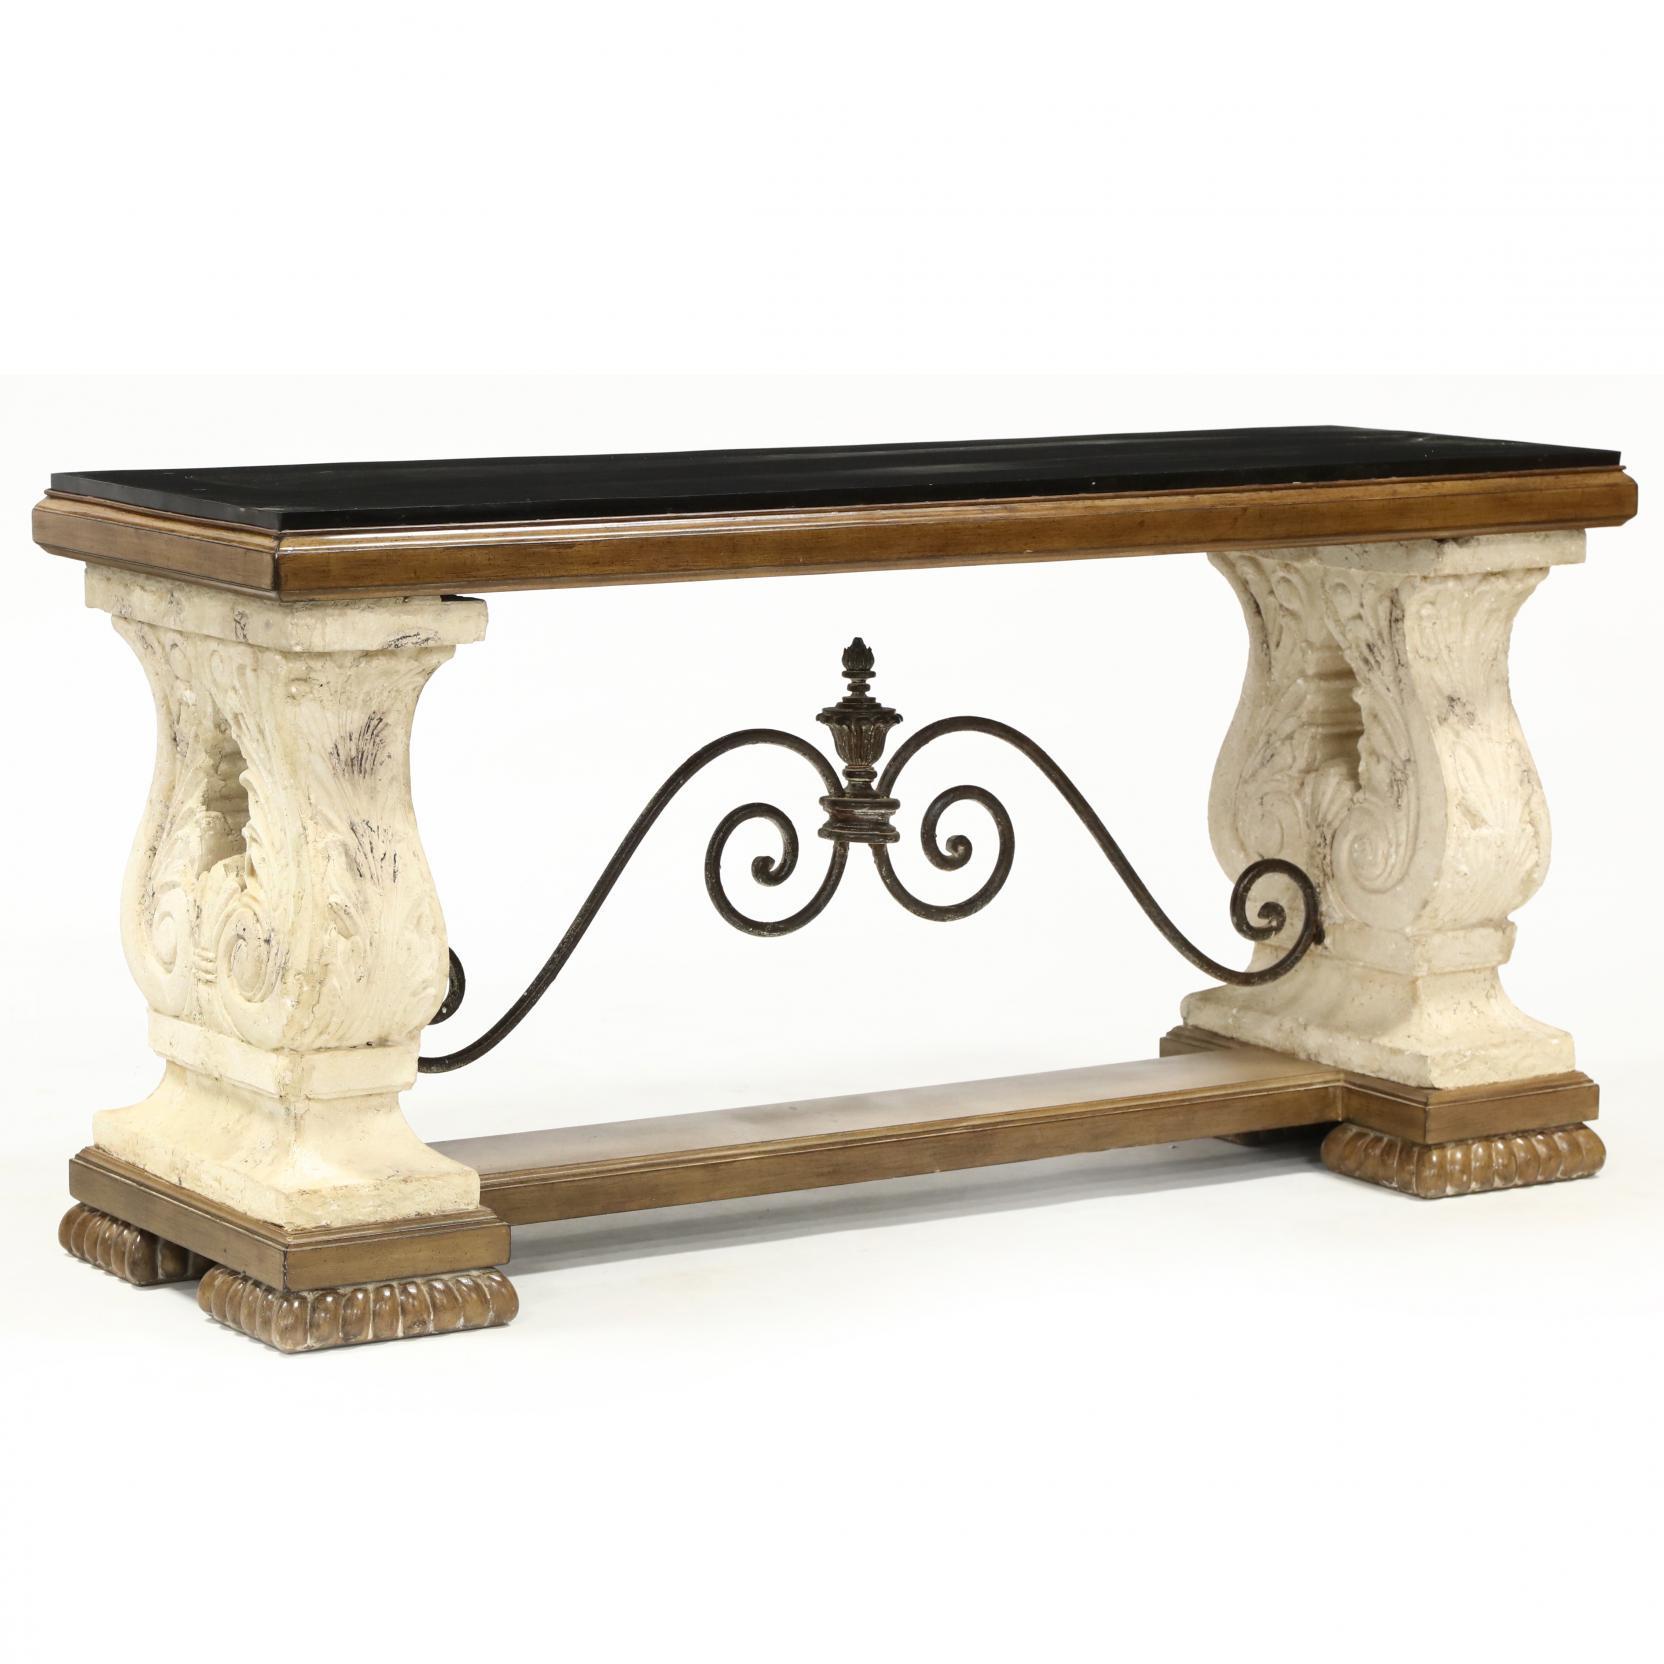 contemporary-architectural-console-table